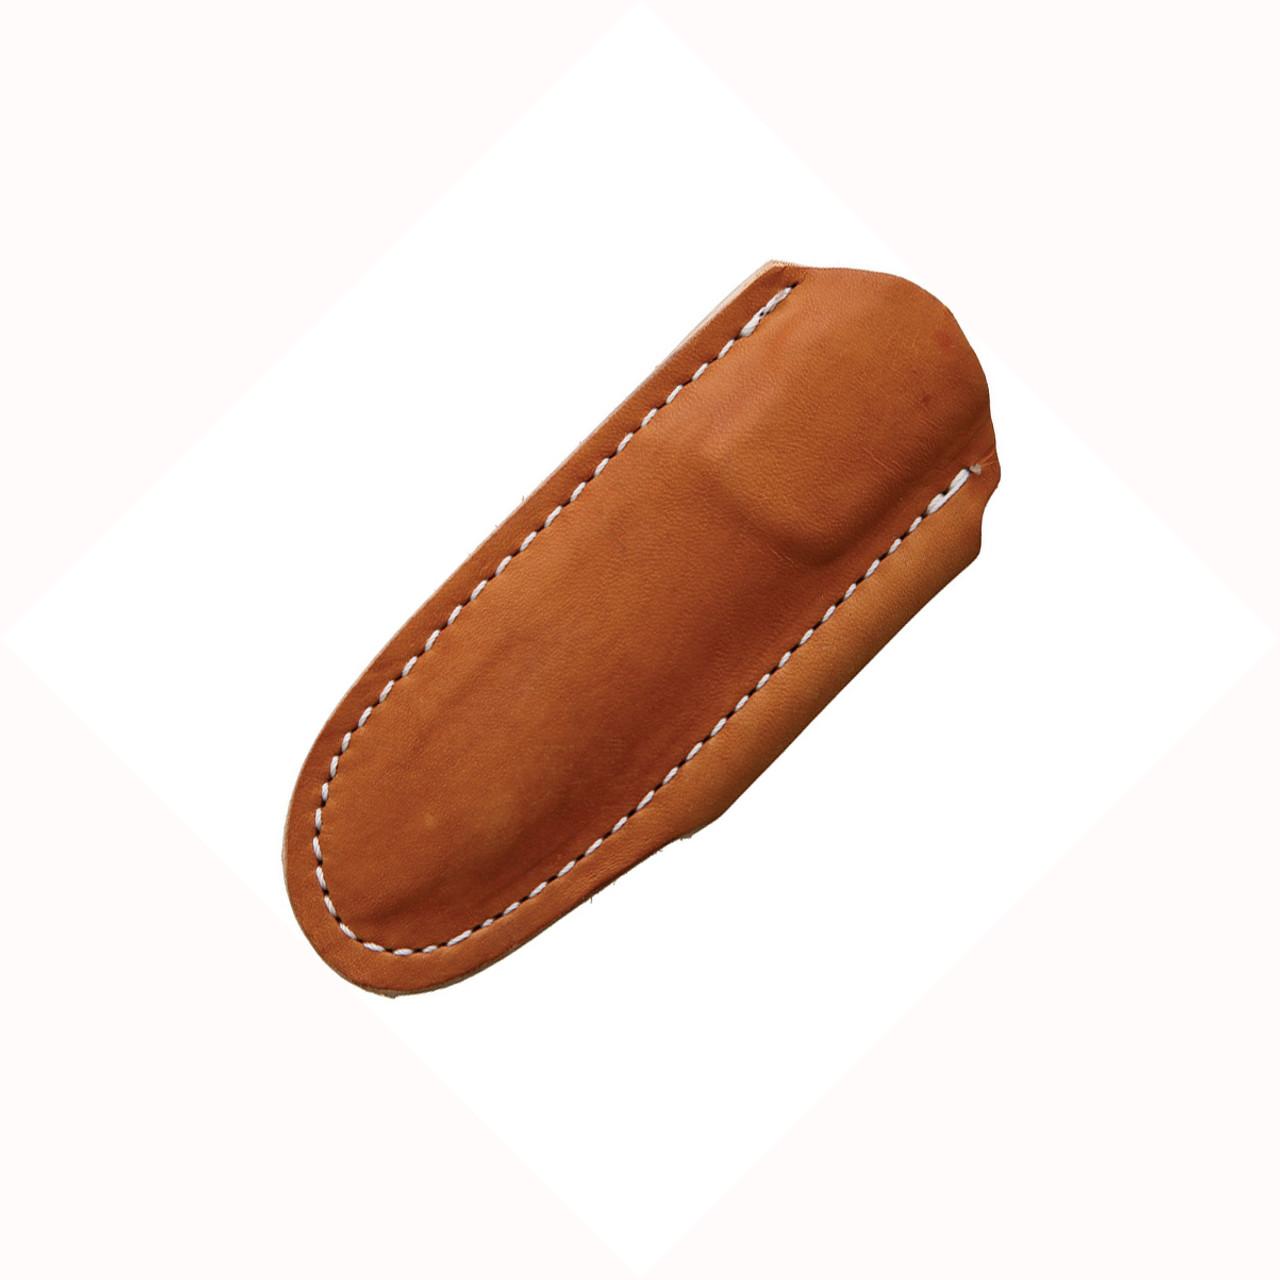 Bradford Guardian 3.5 Tanto, 3D Carbon Fiber Handle, Stonewashed N690 Blade w/Brown Leather Sheath